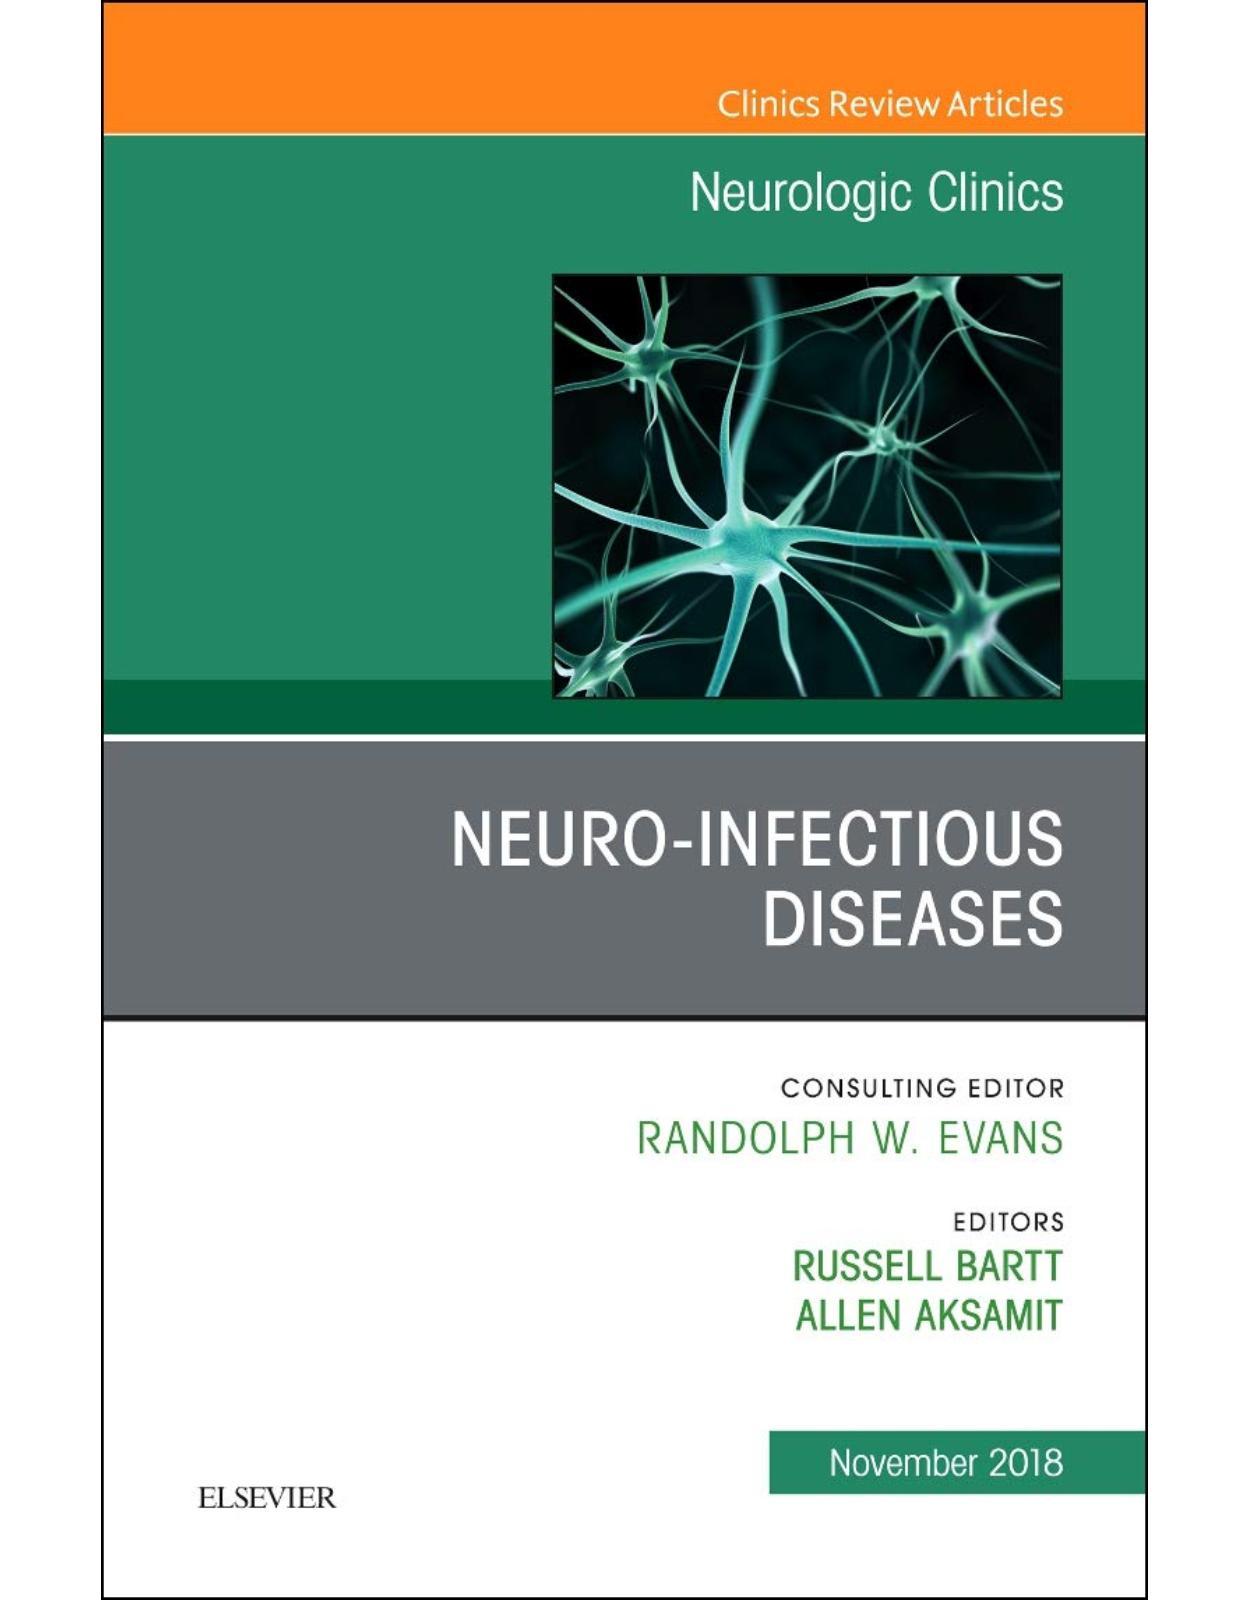 Neuro-Infectious Diseases, An Issue of Neurologic Clinics, Volume 36-4